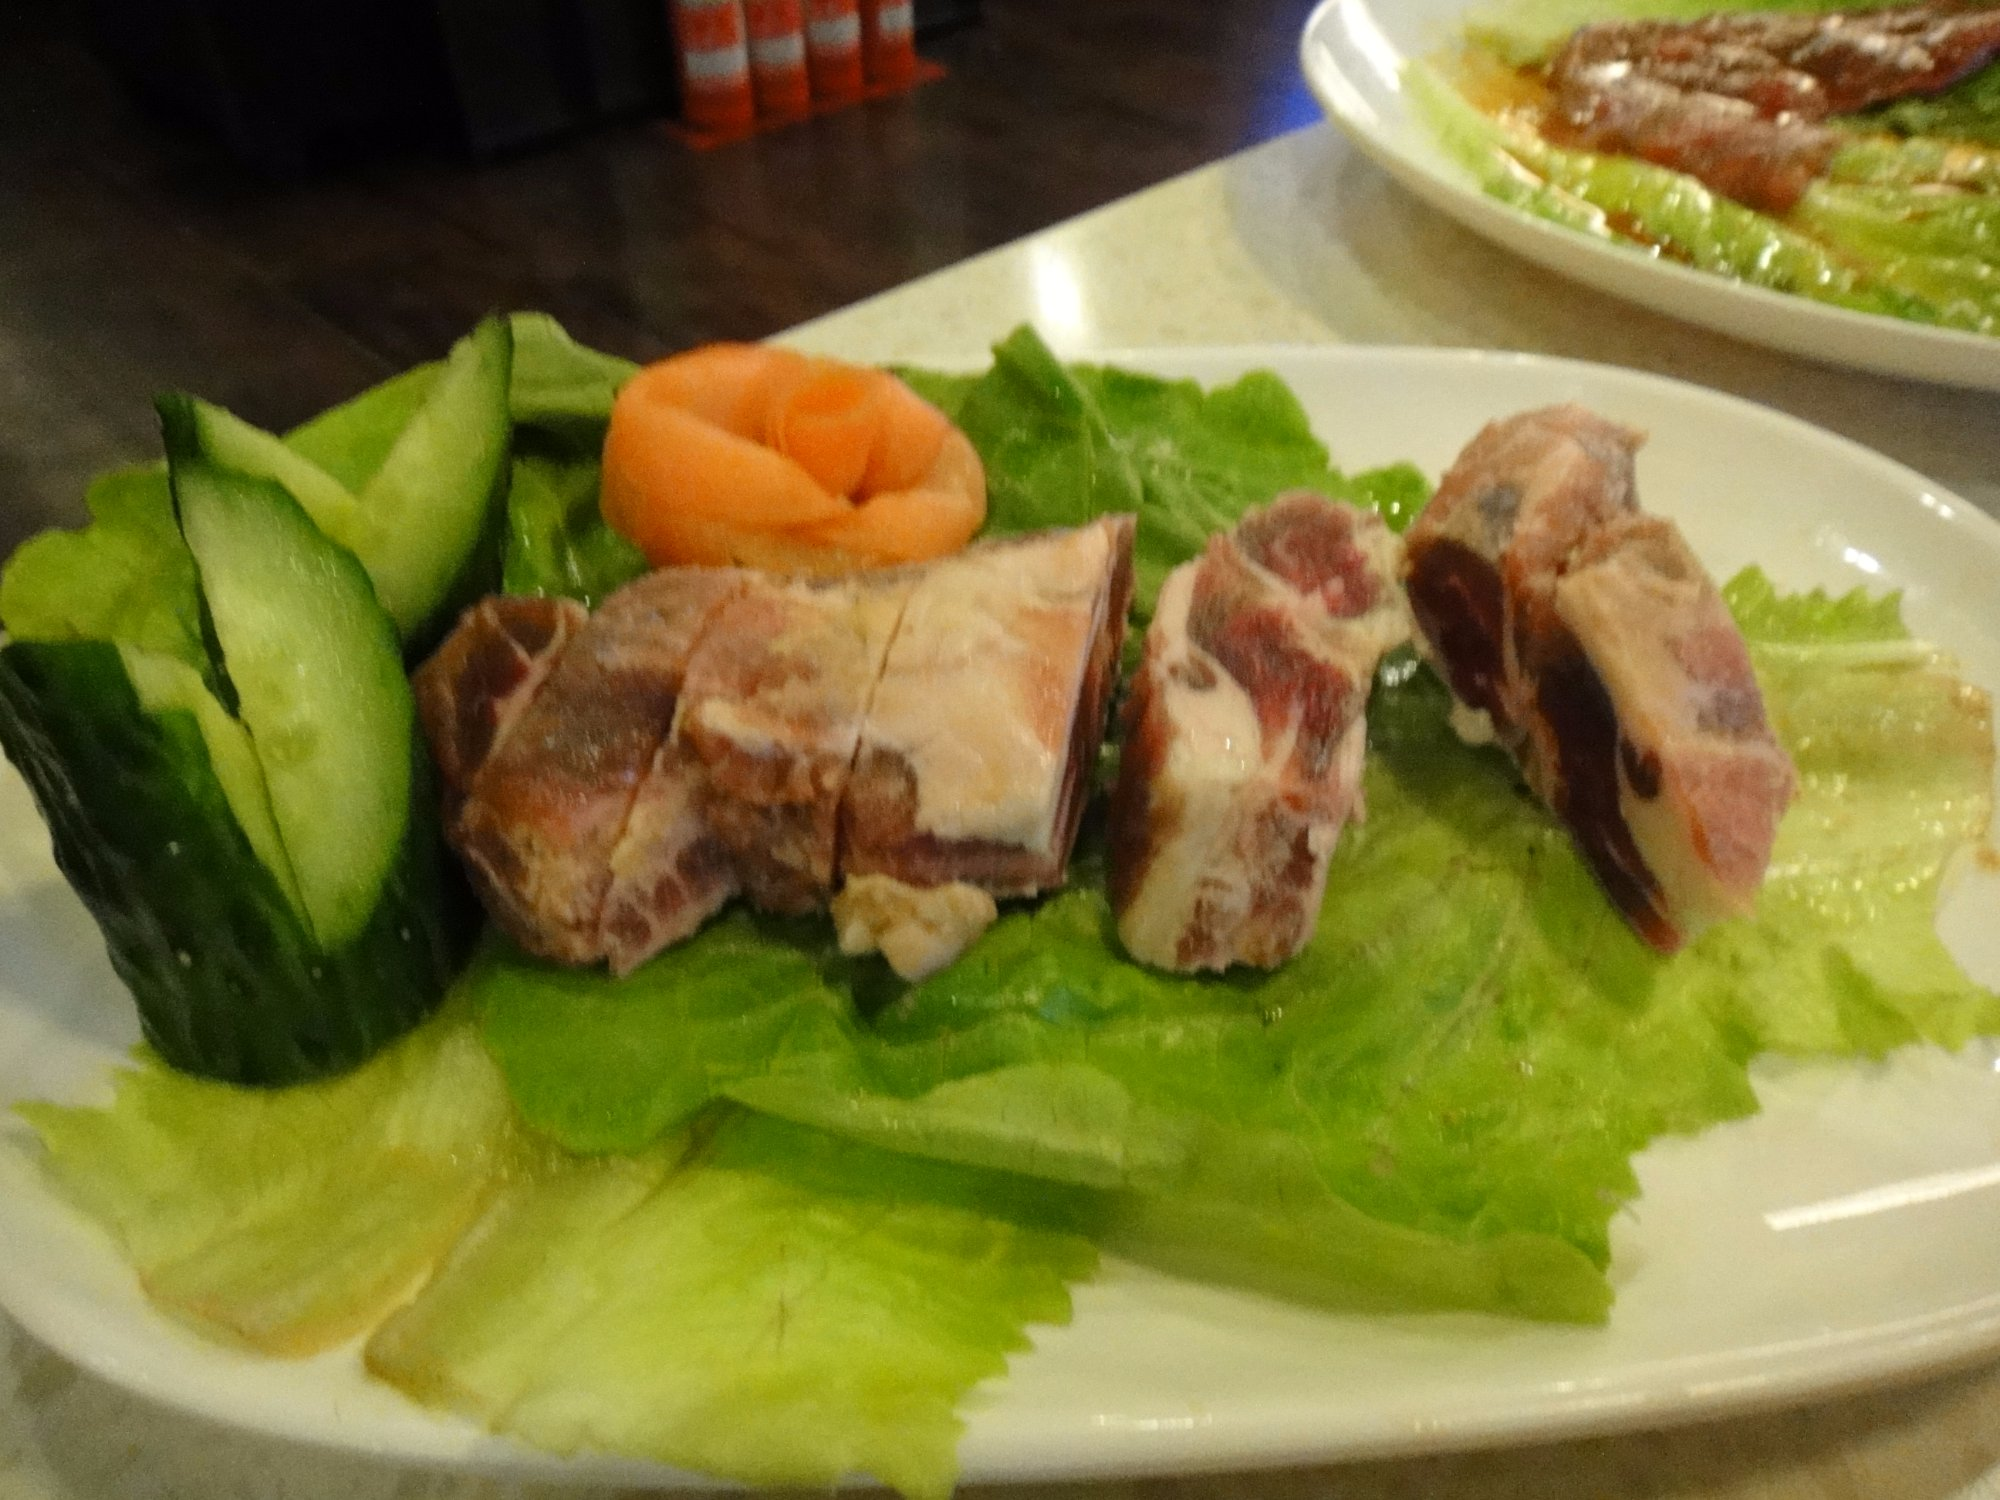 Jin Han Gong Korean Restaurant (Wushang)